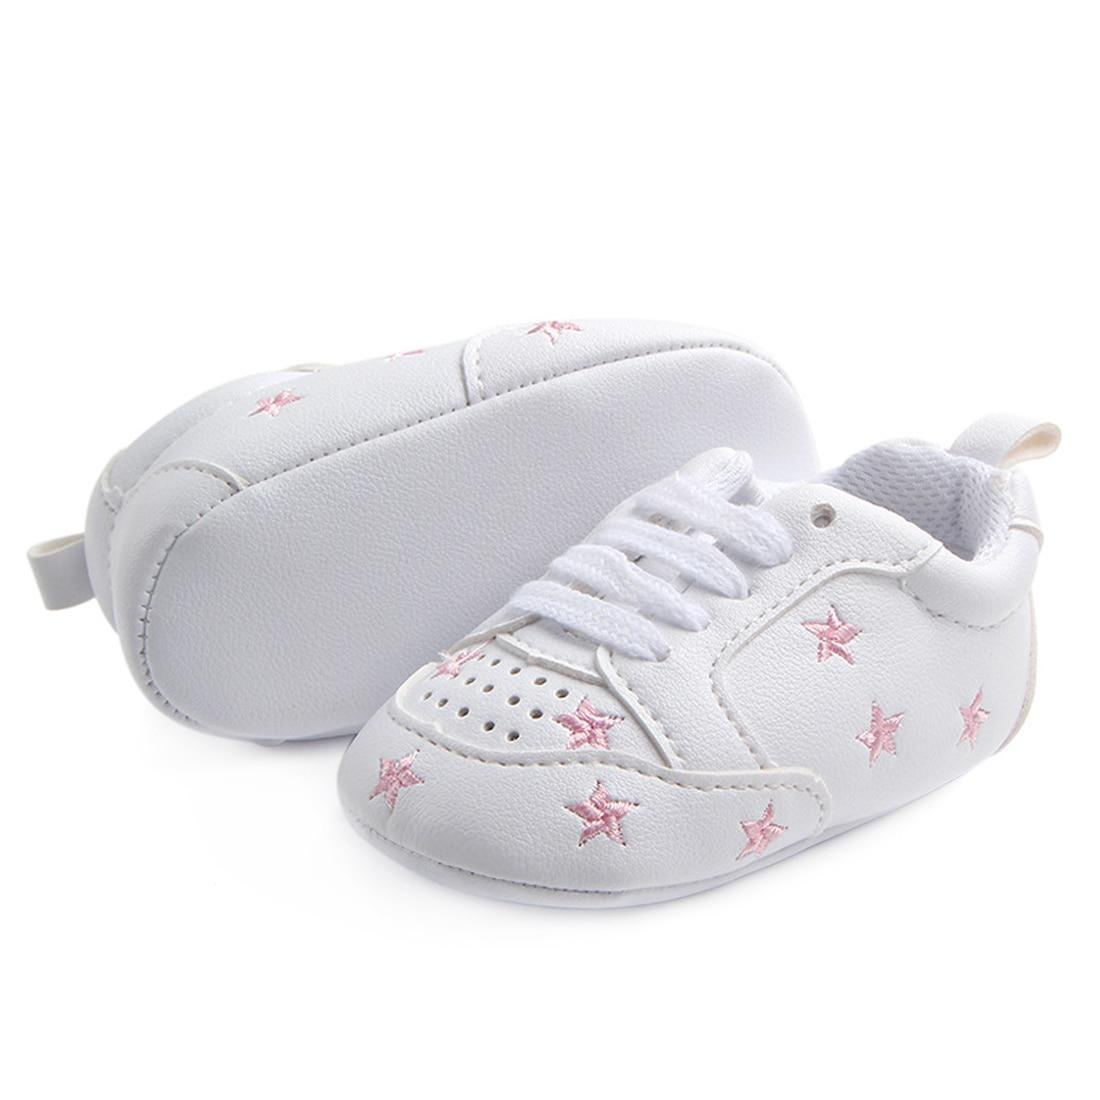 Купить с кэшбэком Baby Crib Shoes for Boys  Soft Sole PU Leather Moccasins Girl Sneakers Little Kid Newborn footwear Tenis Infantil Toddler Tennis